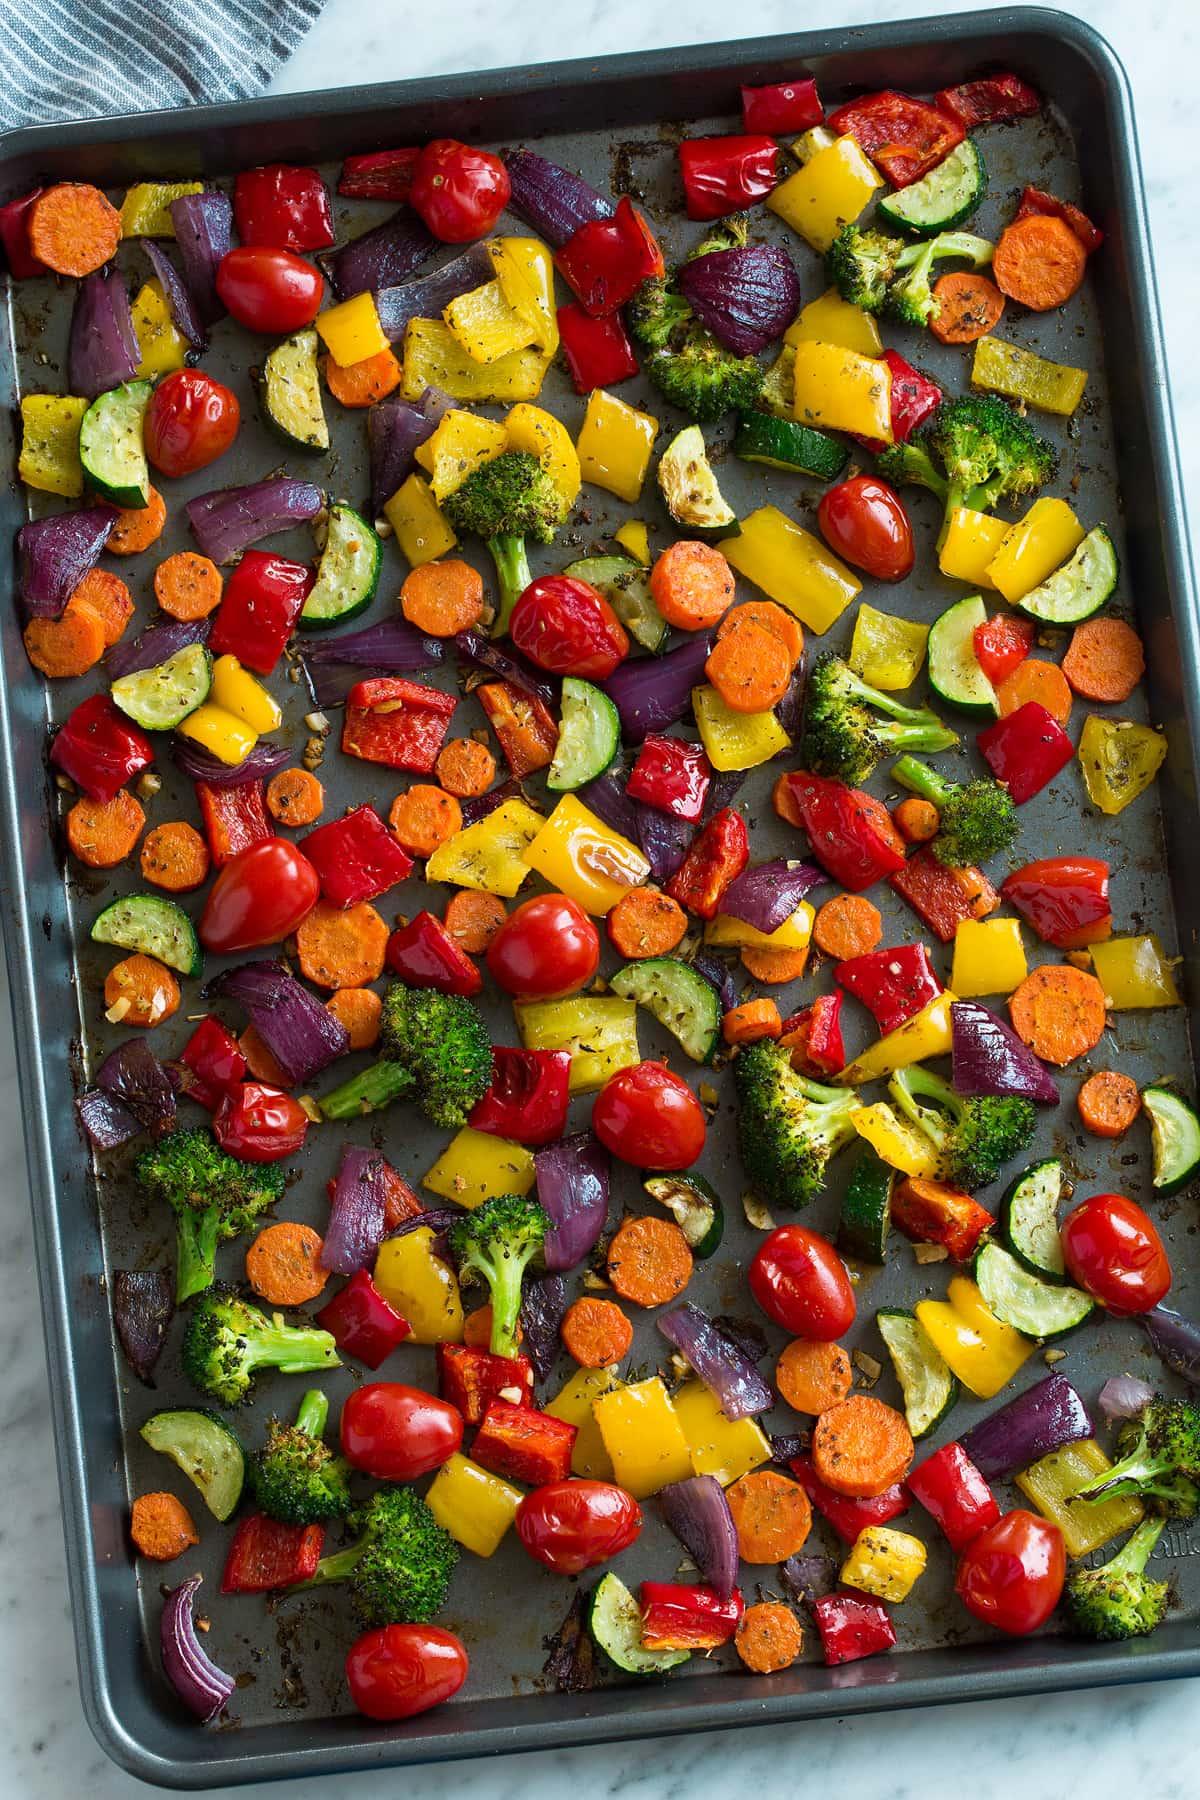 Overheat image of Roasted Vegetables on a dark baking sheet.